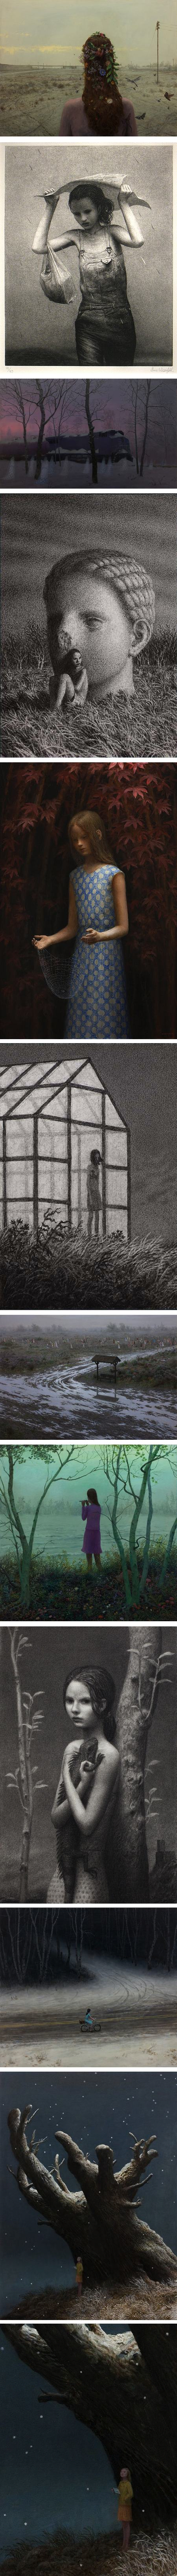 Solstice: solo exhibition of Aron Wieseifeld at Arcadia Contemporary Soho